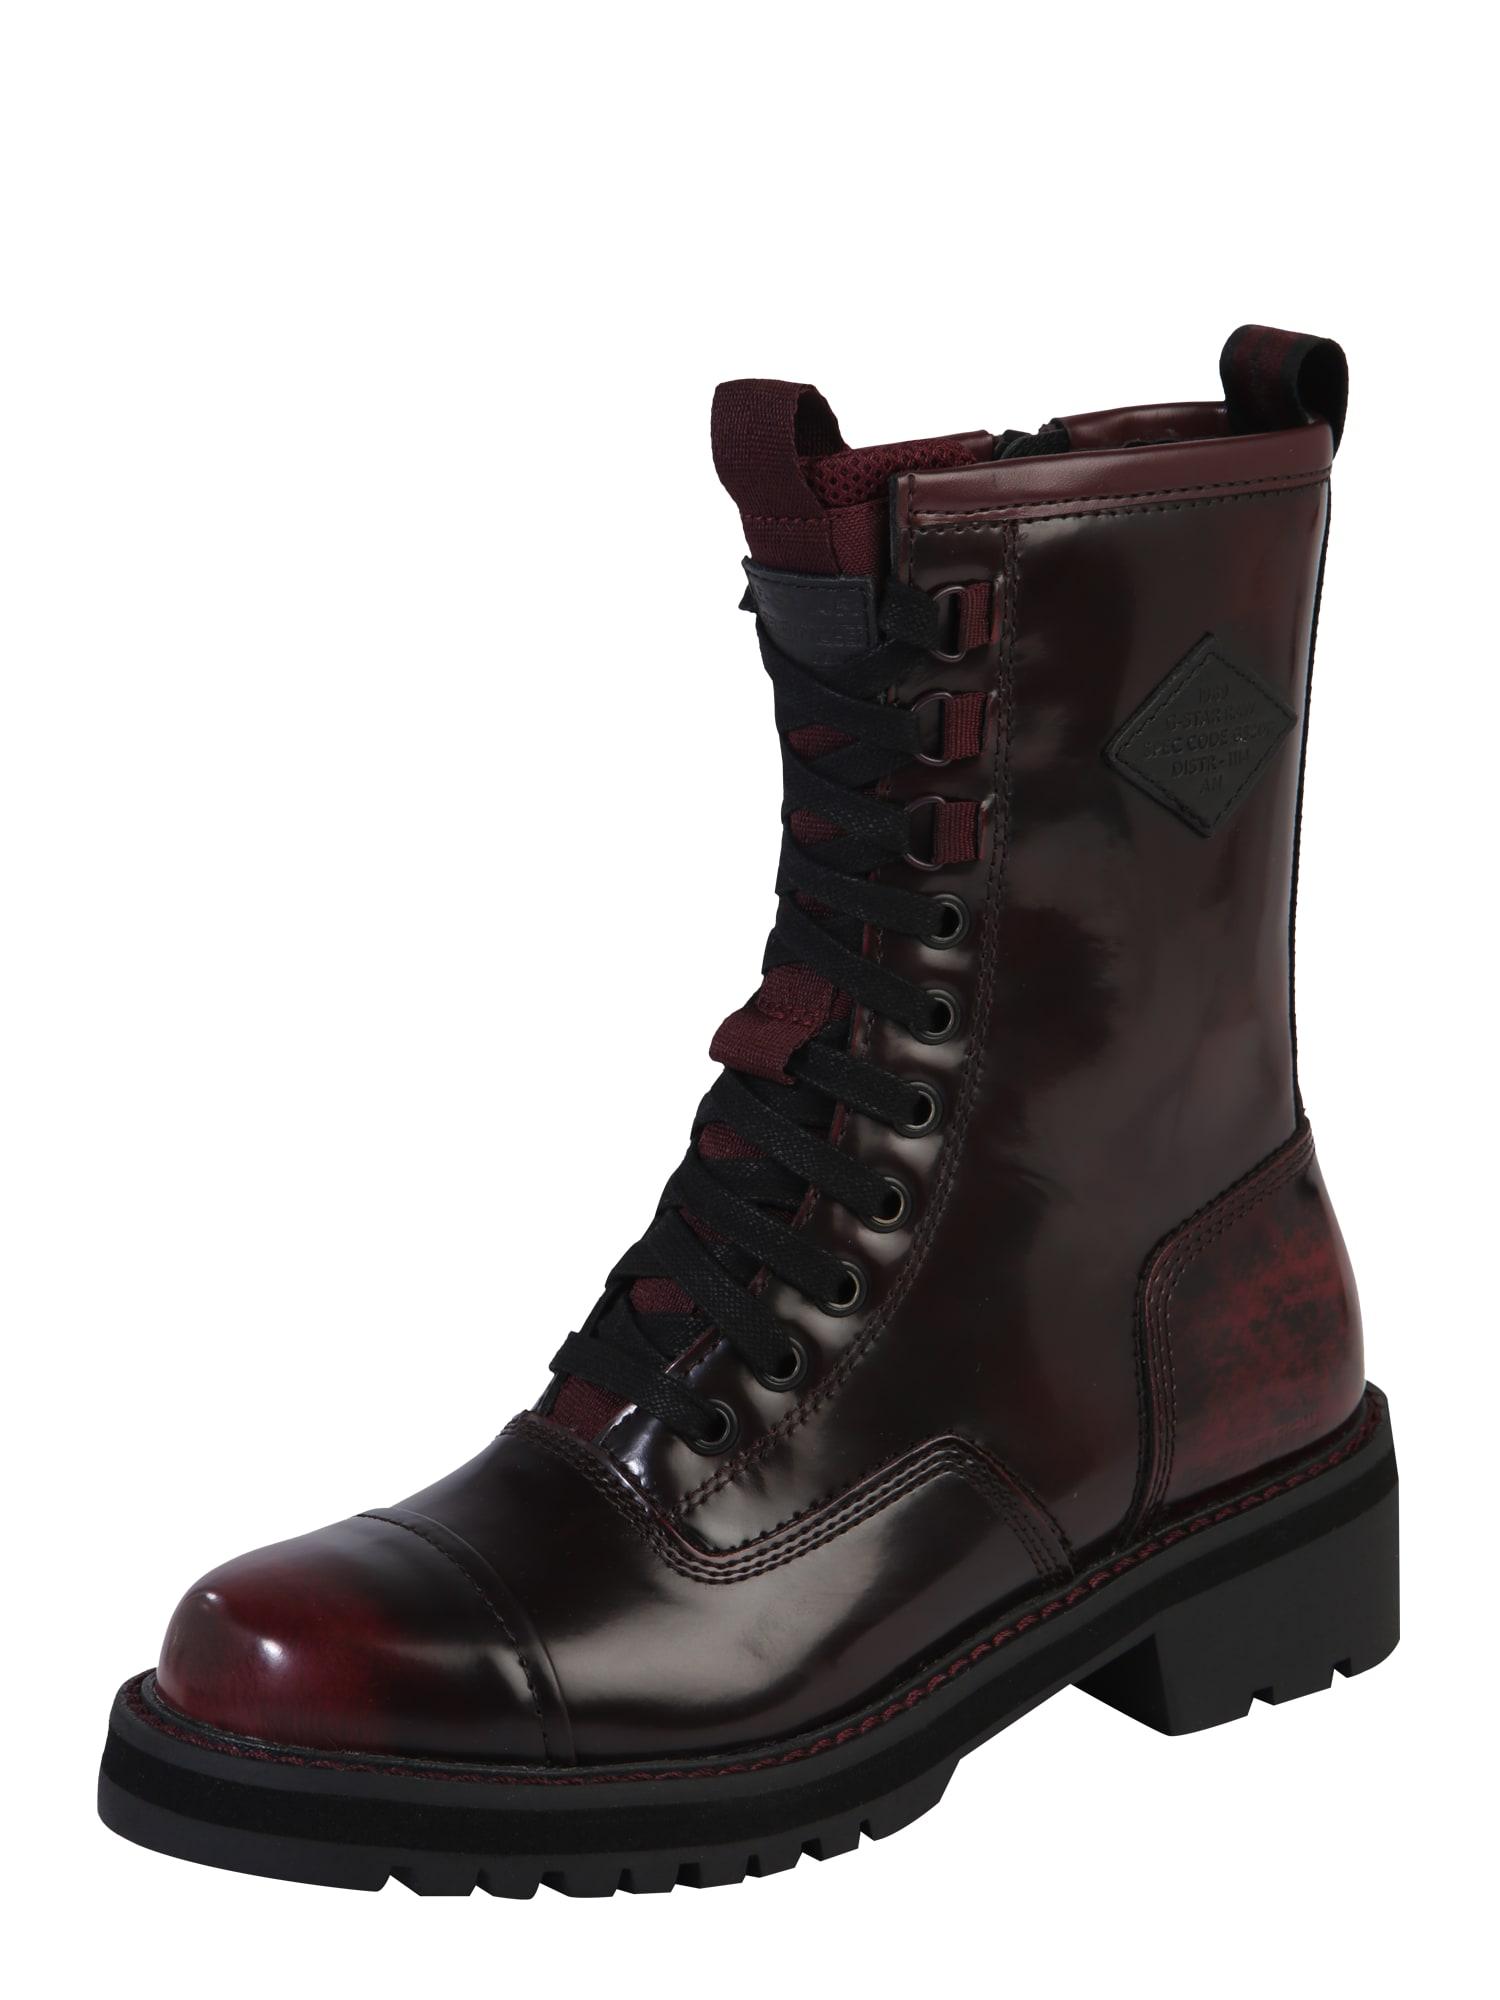 G-Star RAW Cizme 'Premium Minor Boot'  bordeaux